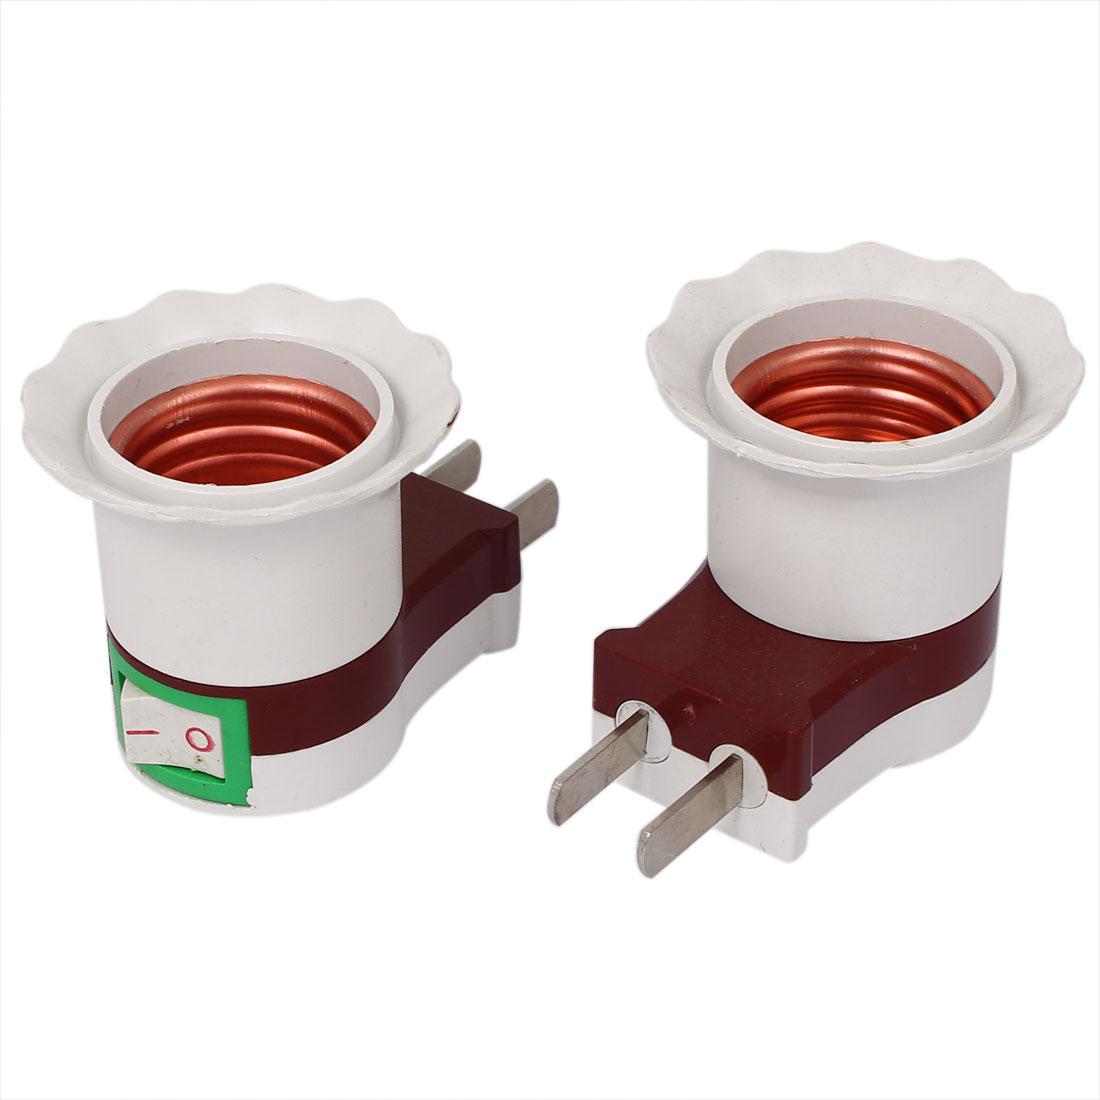 AU US Plug Screw Type E27 Bulb Base Lamp Holder Socket Adapter 2pcs